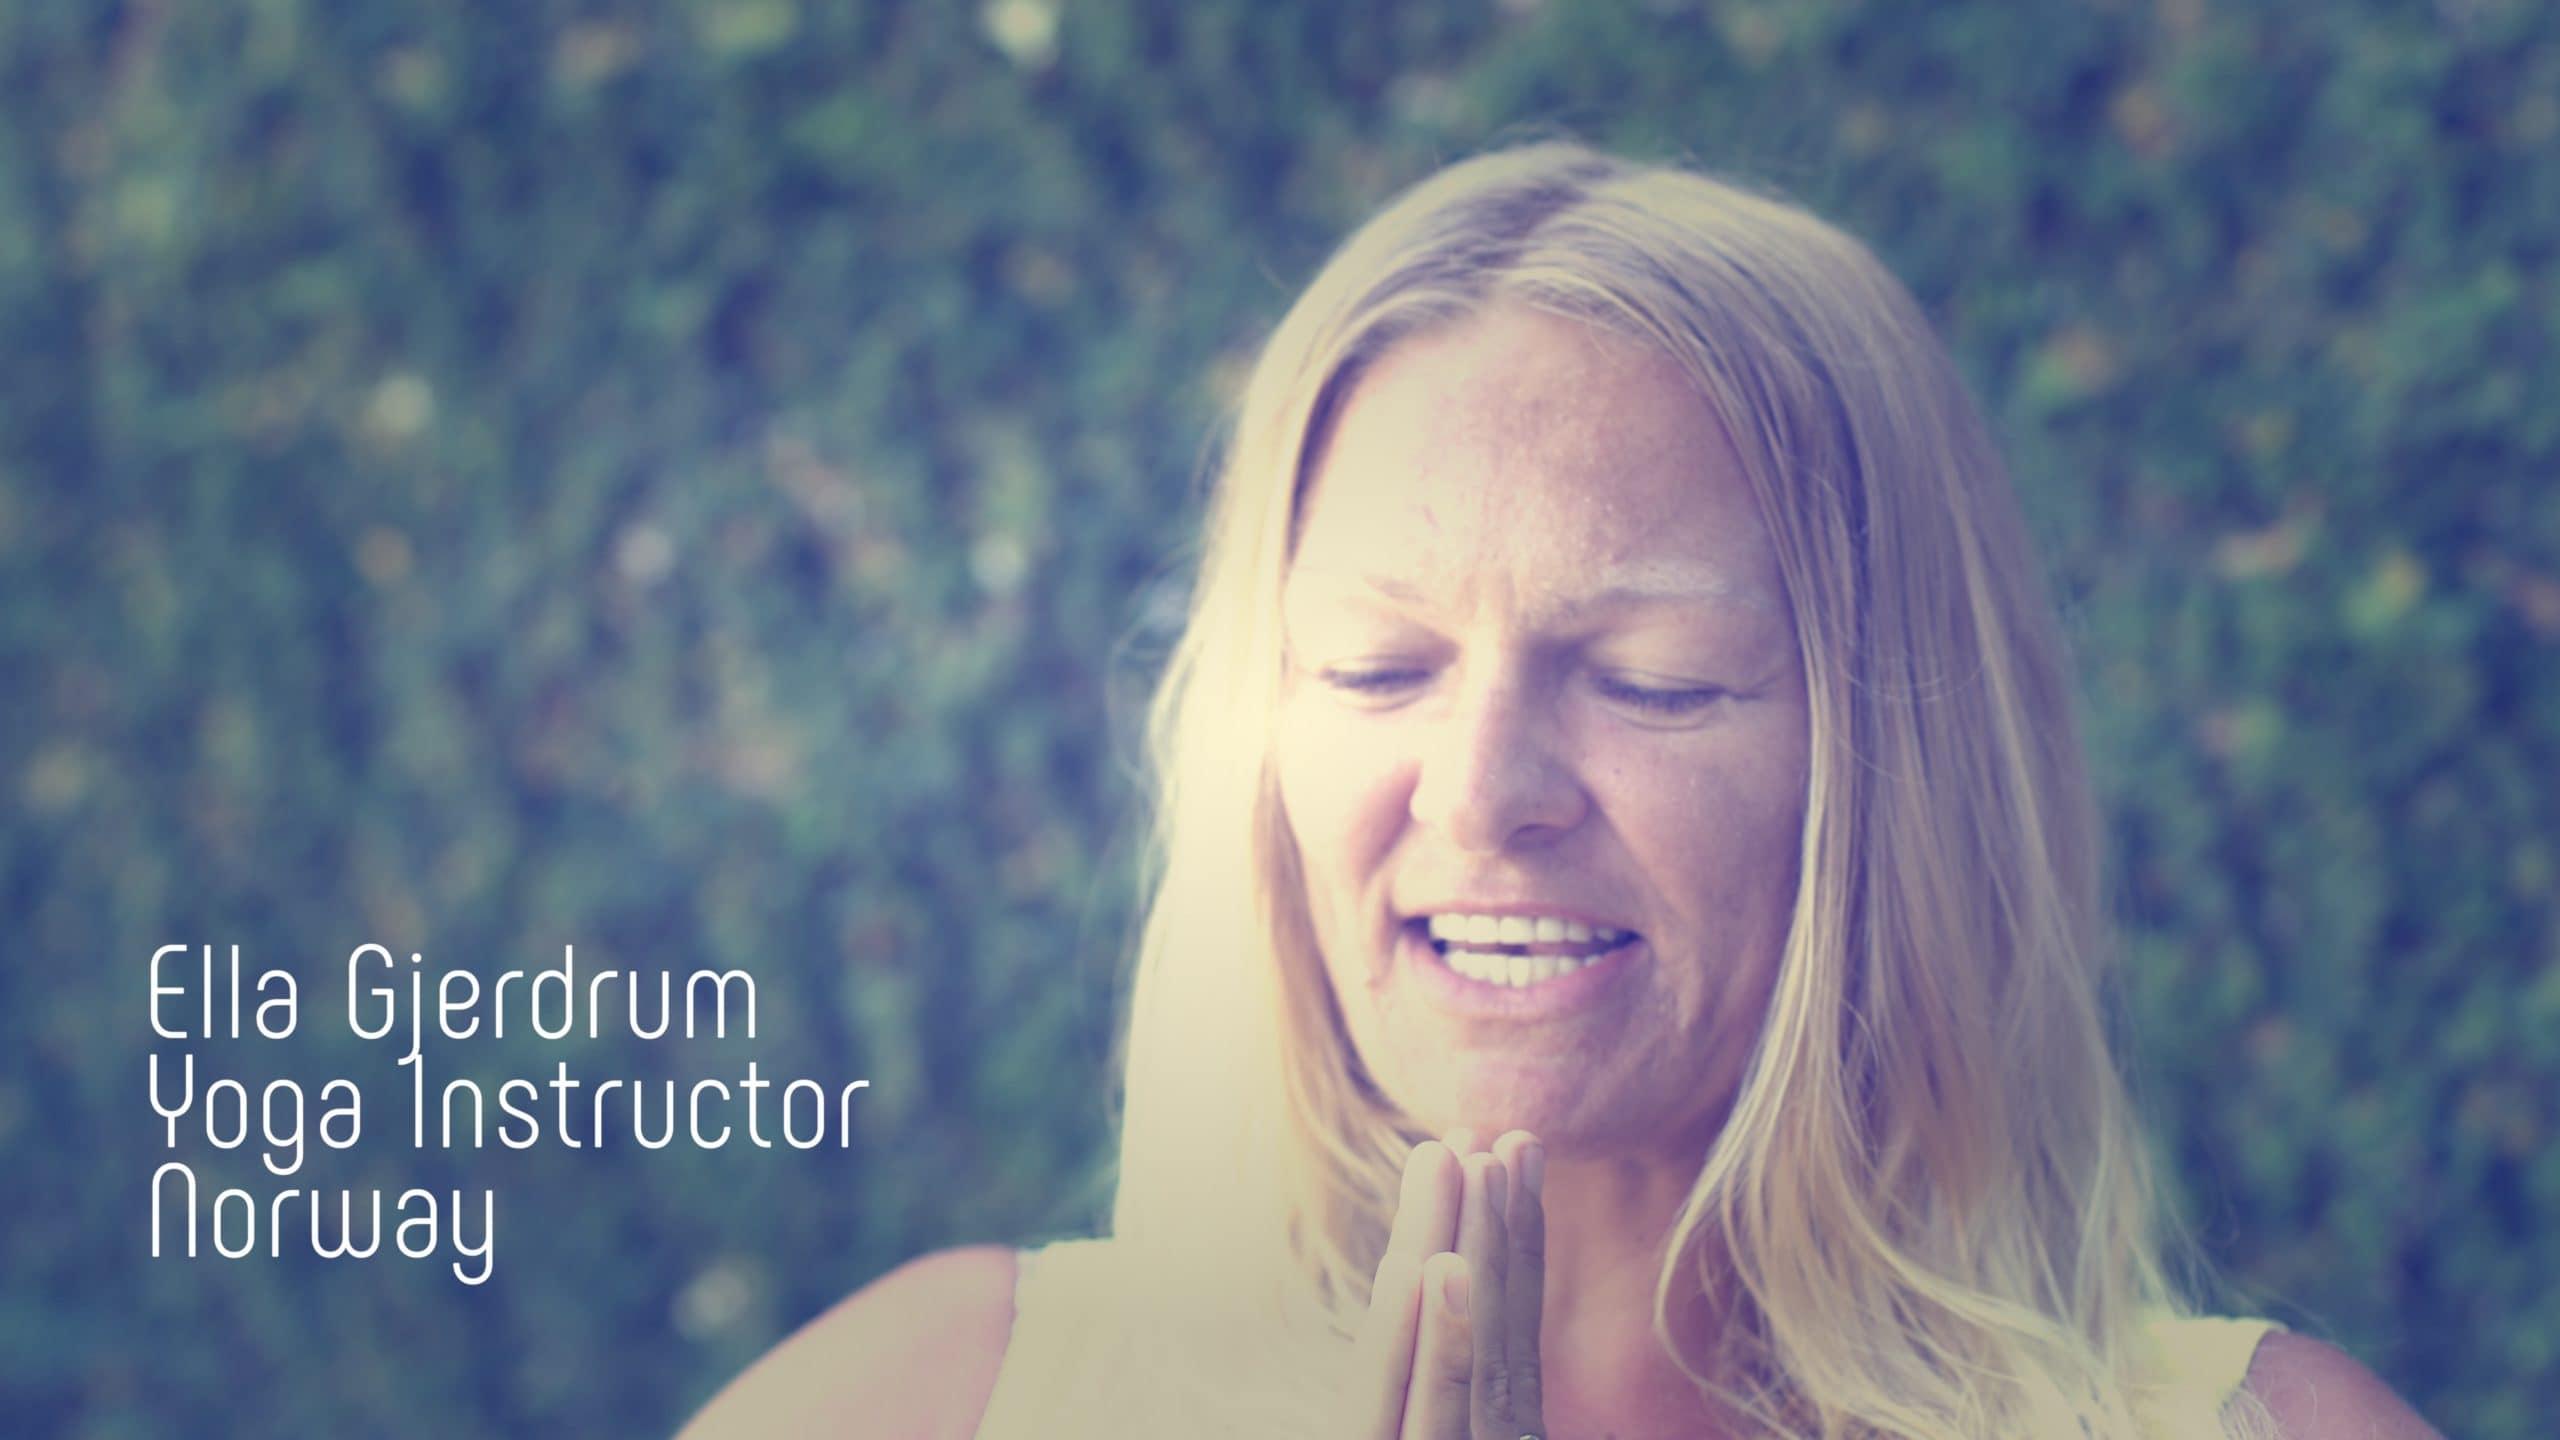 Surfasana Testimonial: Ella Gjerdrum